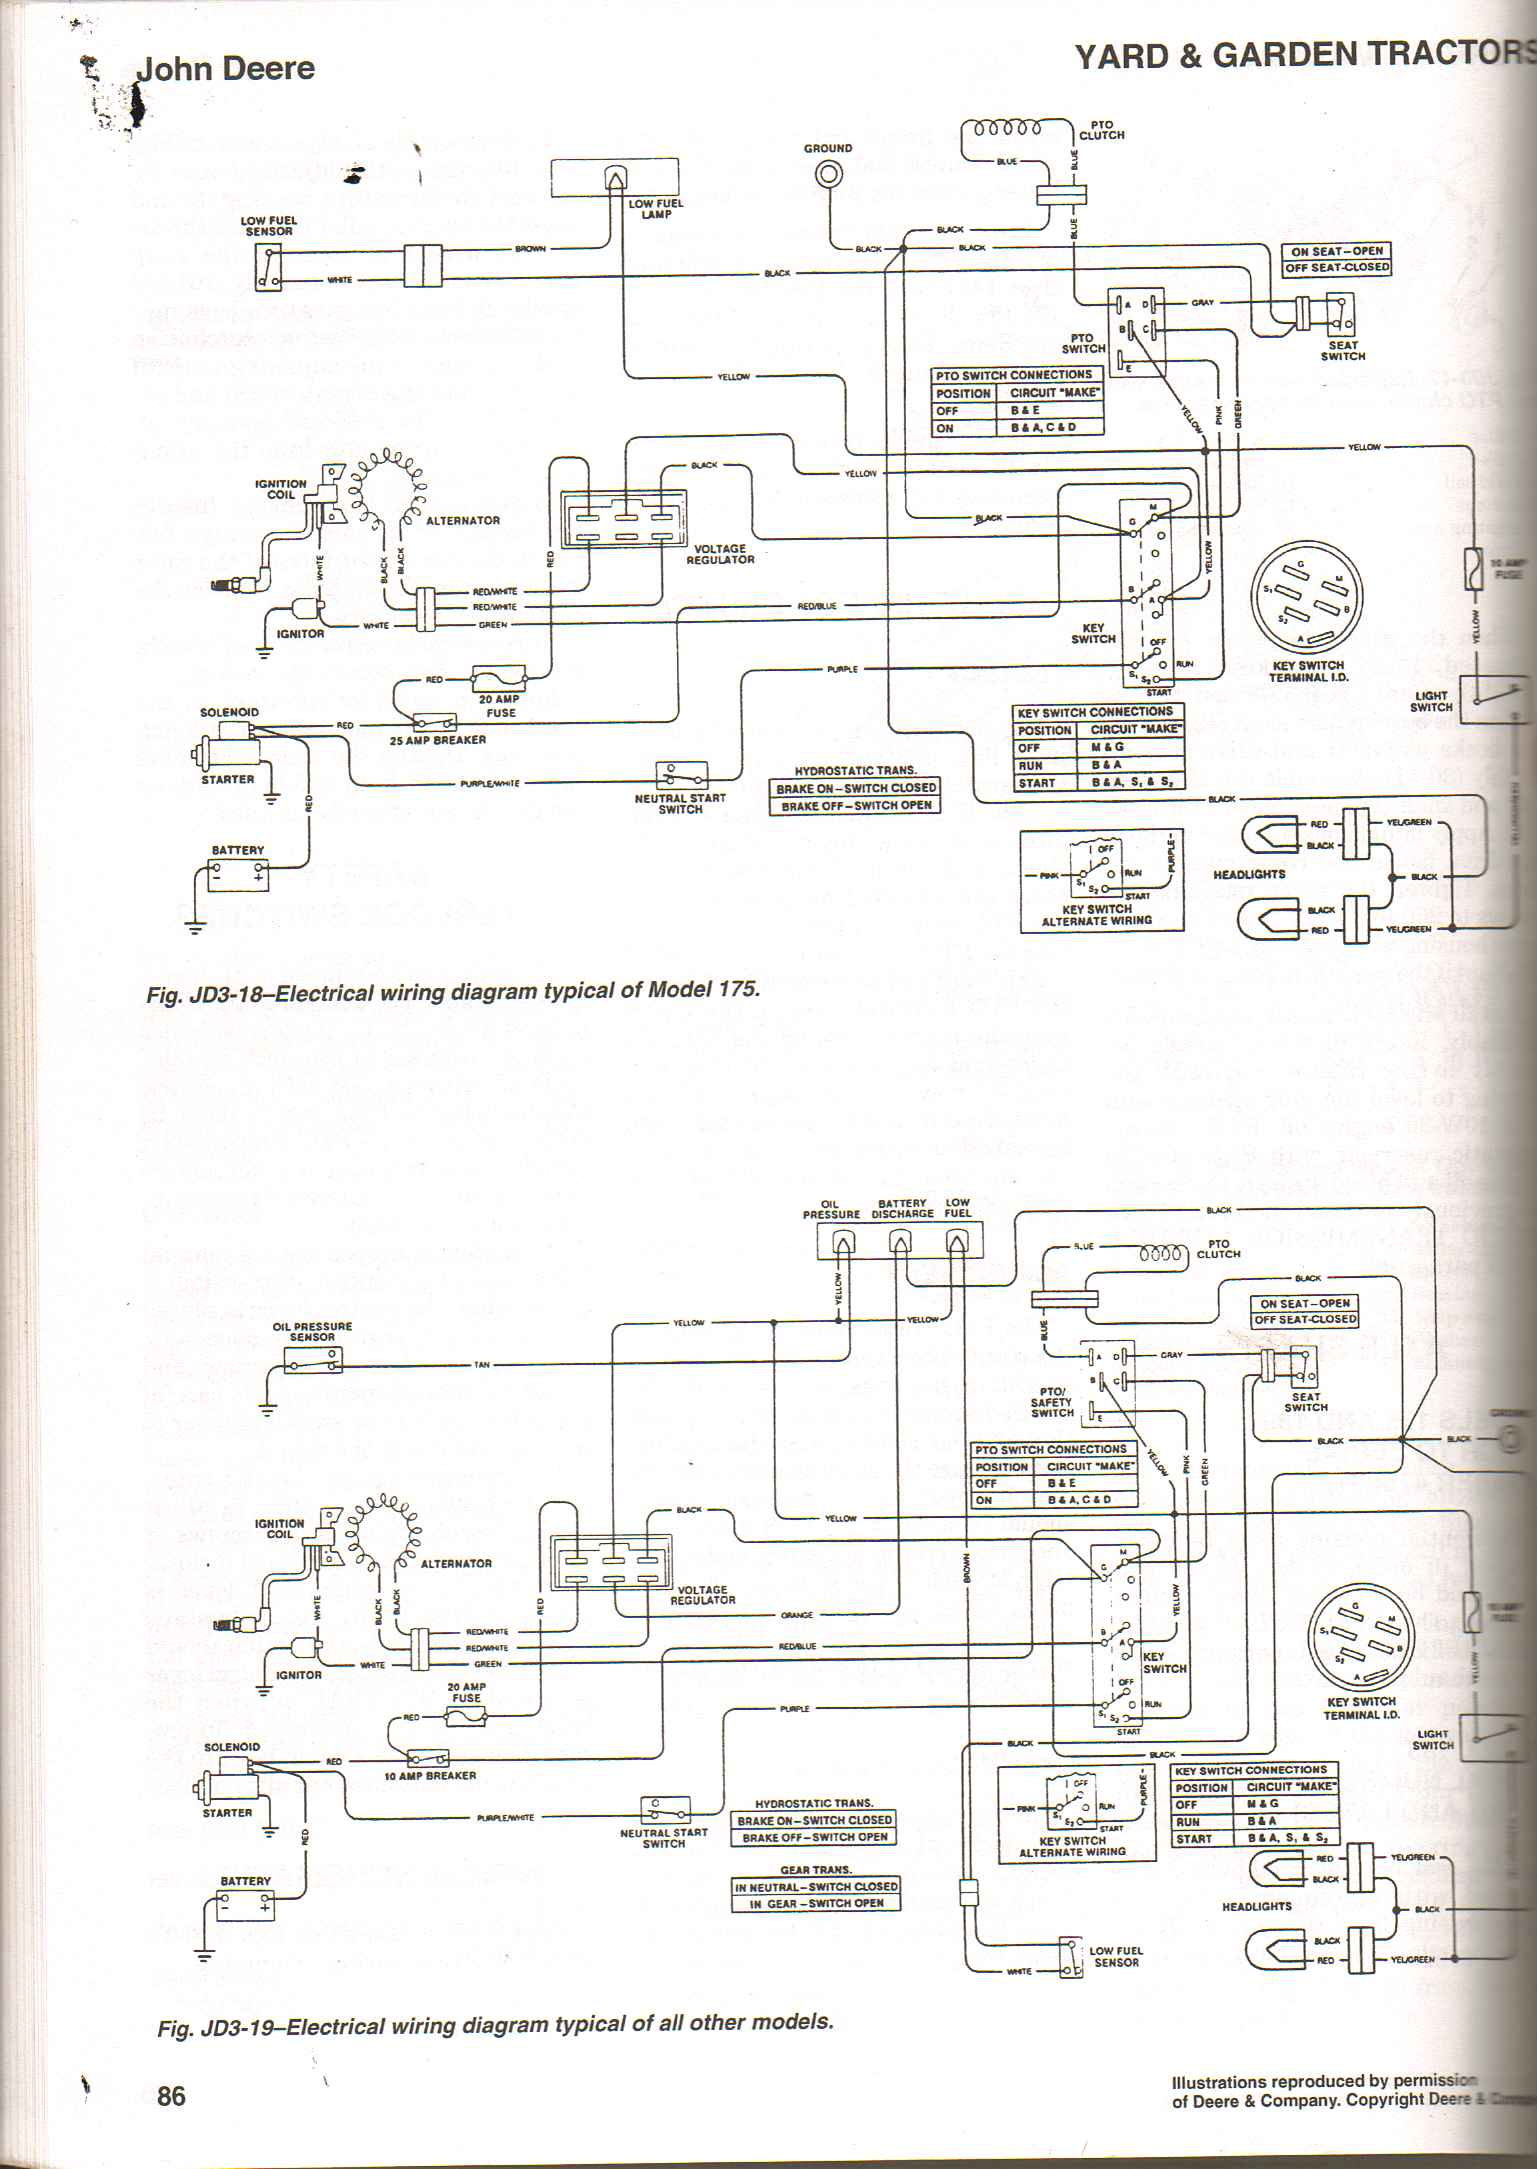 Wiring Diagram John Deere Lawn Tractor : Kb ignition wiring diagram stx tractor get free